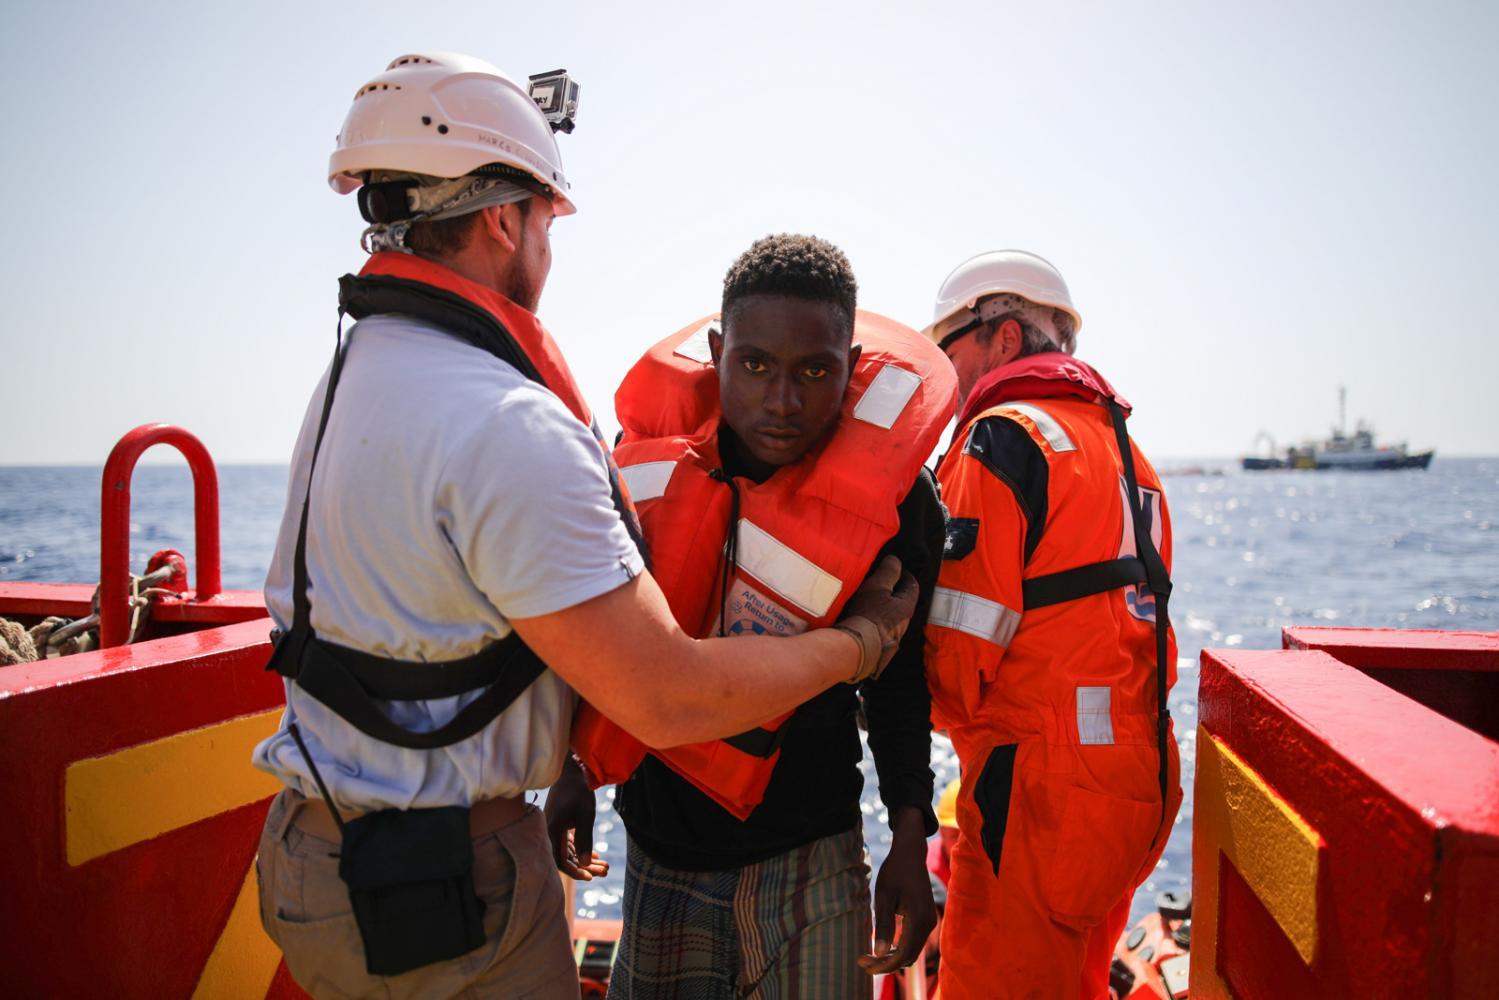 Photography image - Loading 86b1b3d9f5879da6-CK_Refugees_02b.jpg